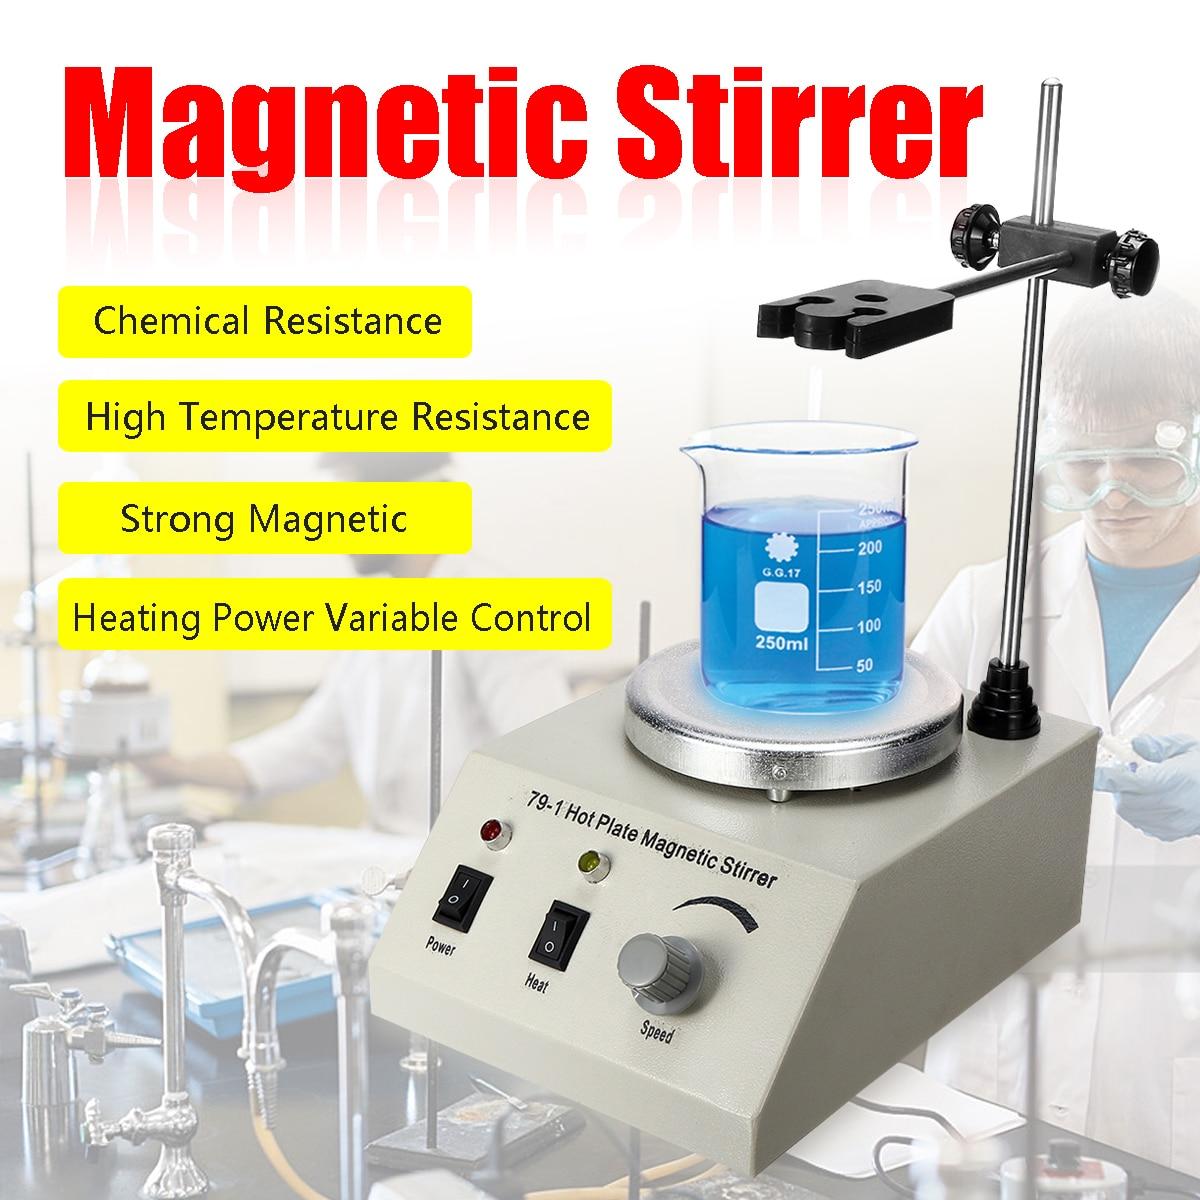 79-1 1000ml Hot Plate Magnetic Stirrer Lab Heating Speed Control Mixer 110/220V No Noise No Vibration US/EU/AU Plug Smooth Run